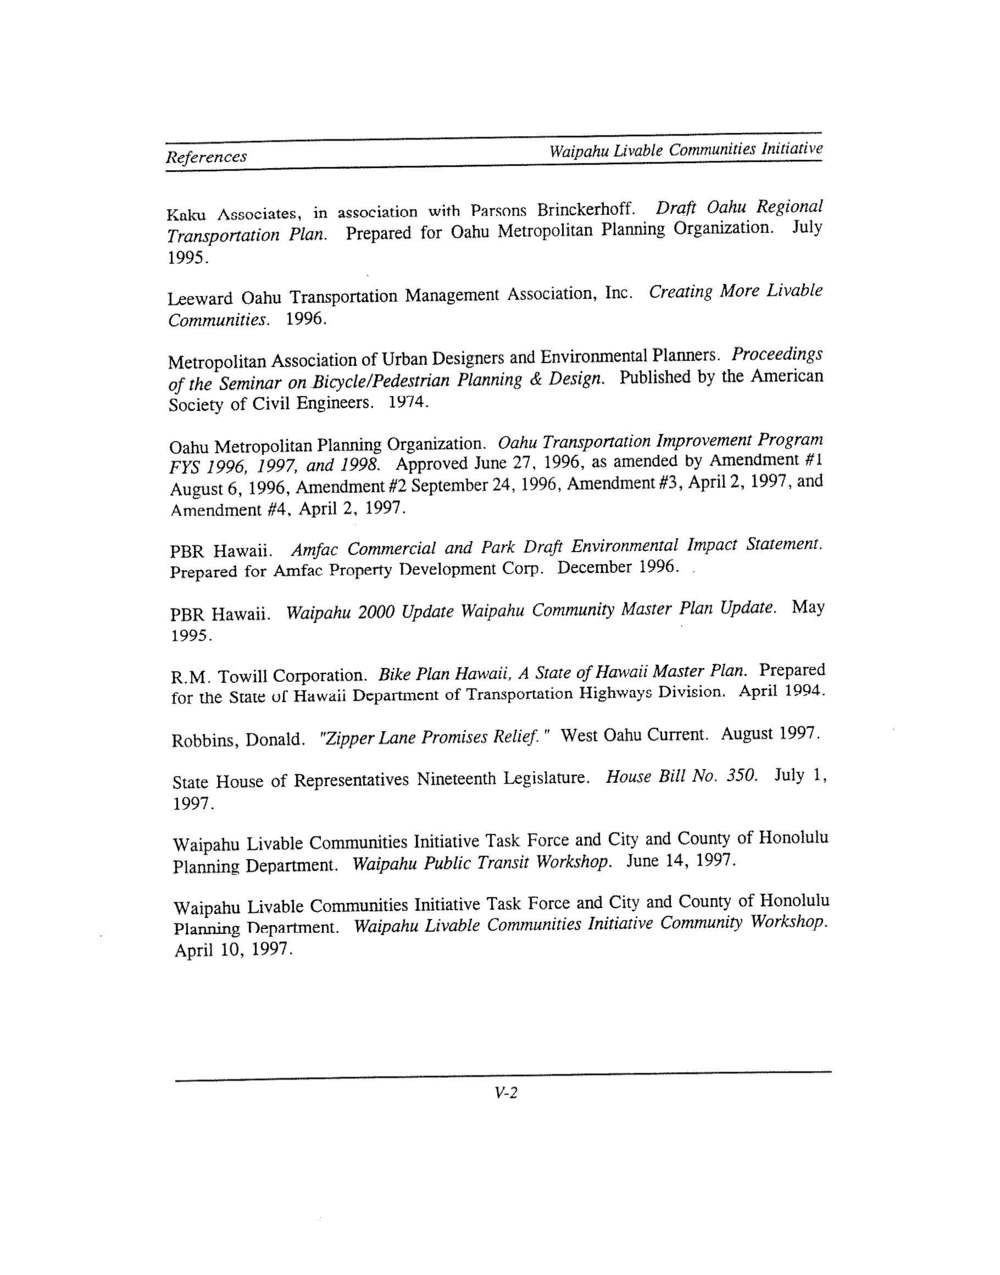 160531_WaipahuLivableCommunities(1998)_Page_155.jpg